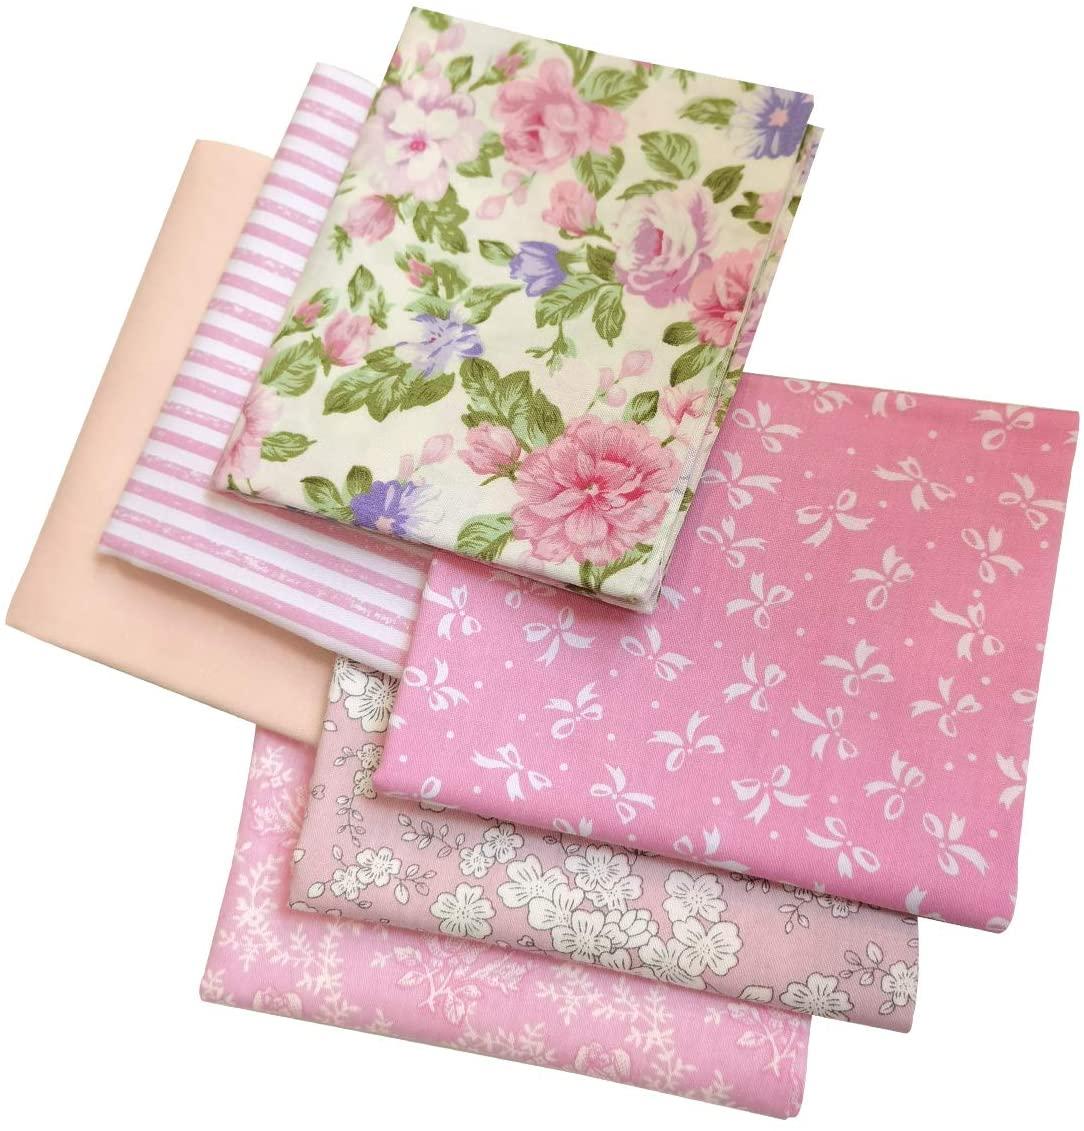 Mililanyo 6Pcs Cotton Fabric Bundles Patchwork, 46 x 56cm Pink Printed Patterns Sewing Patchwork for DIY Artcraft